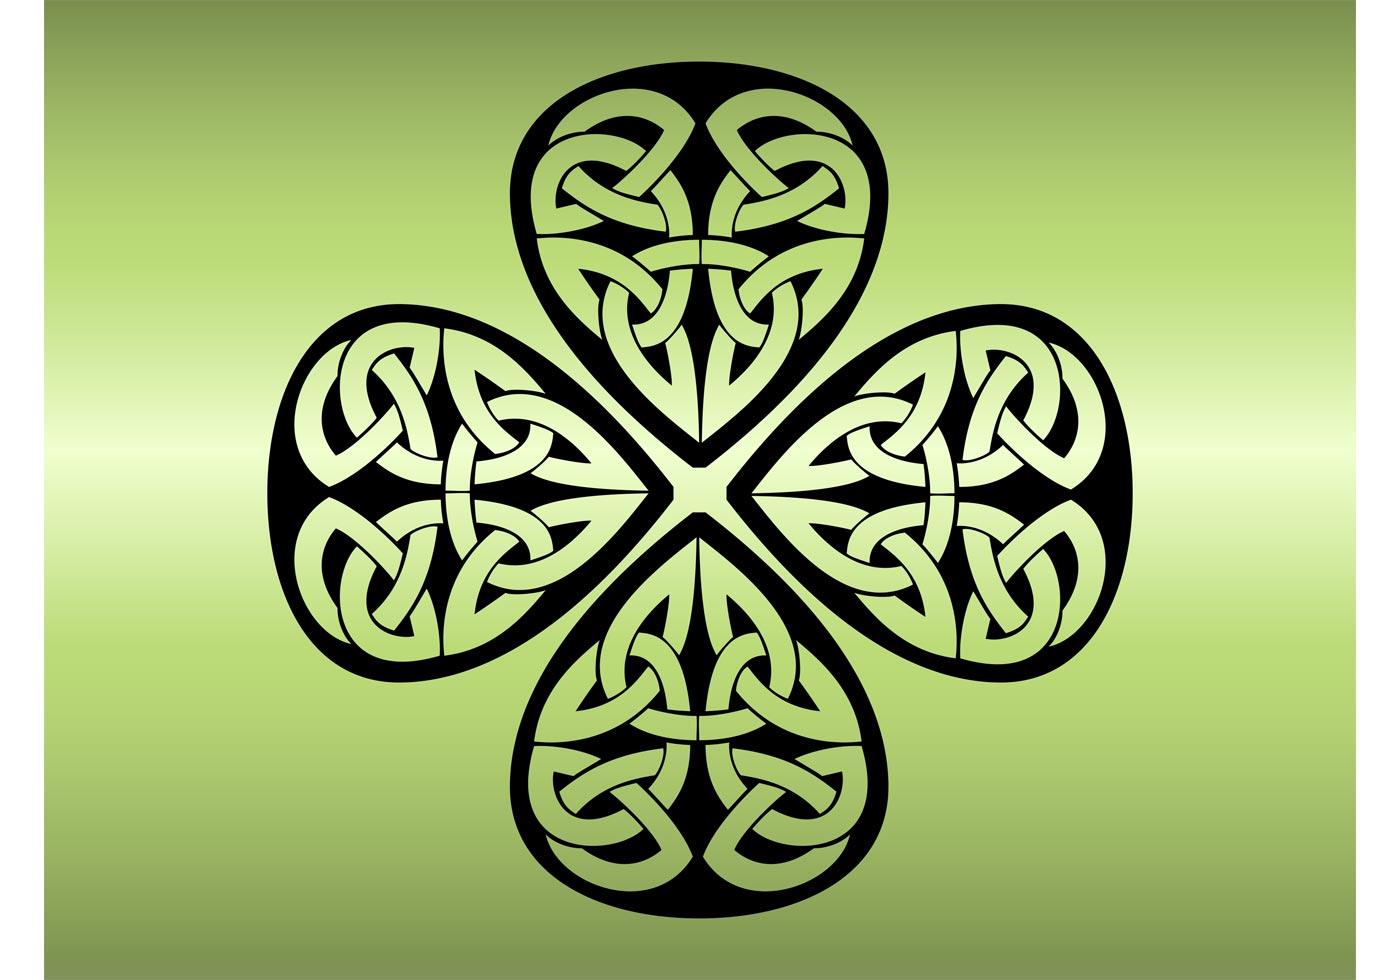 Irish Shamrock Free Vector Art 136 Free Downloads